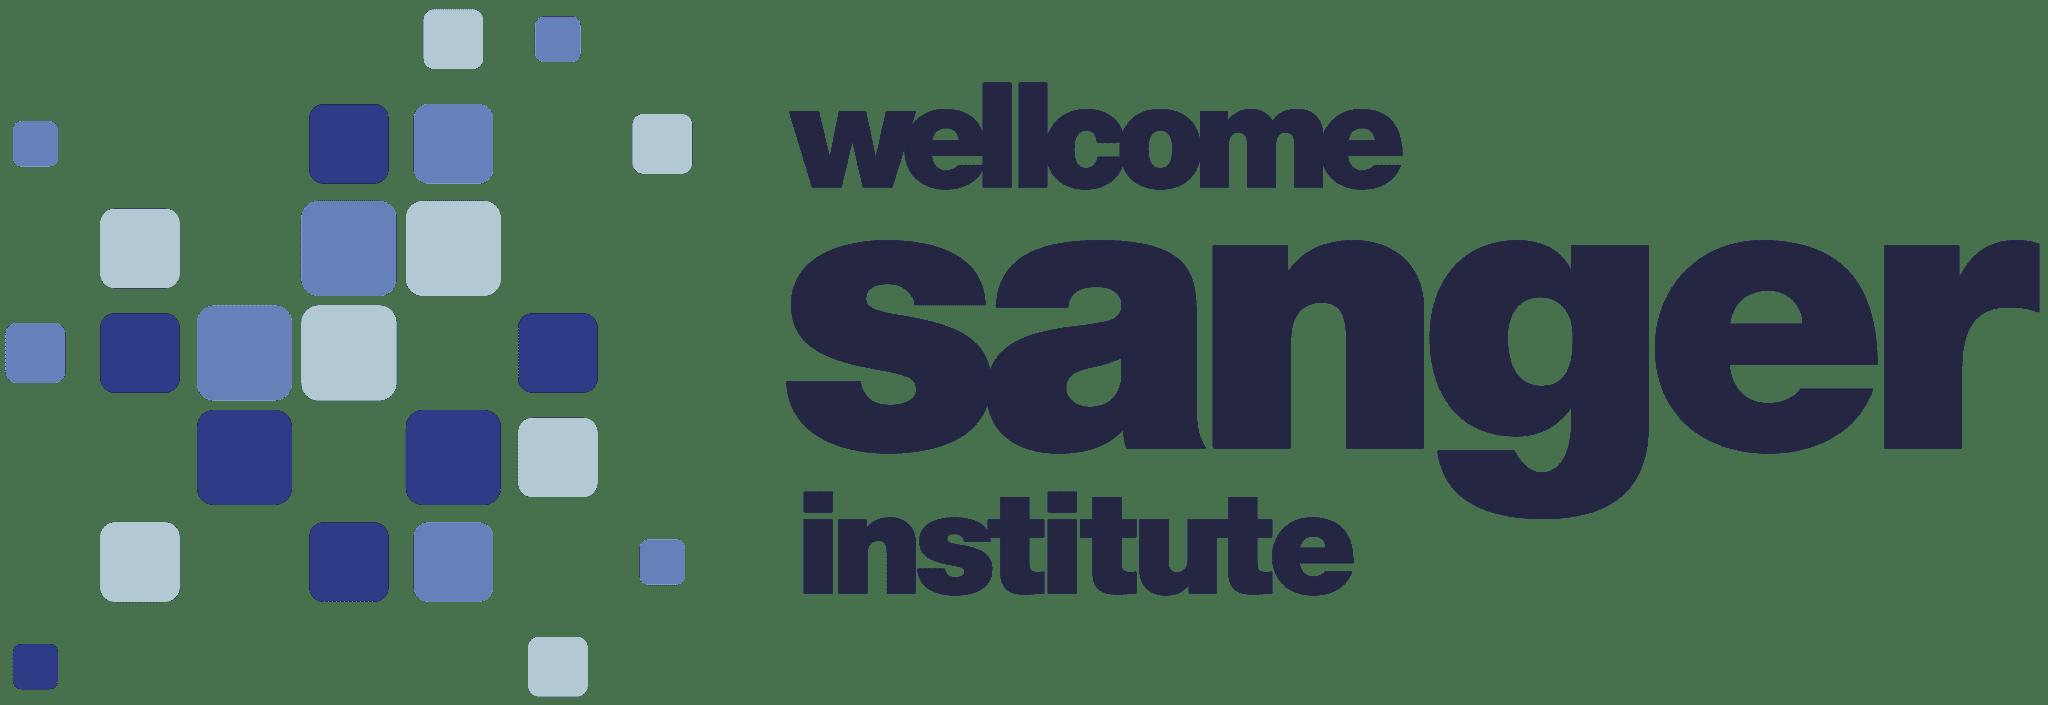 wellcome sanger institute logo1